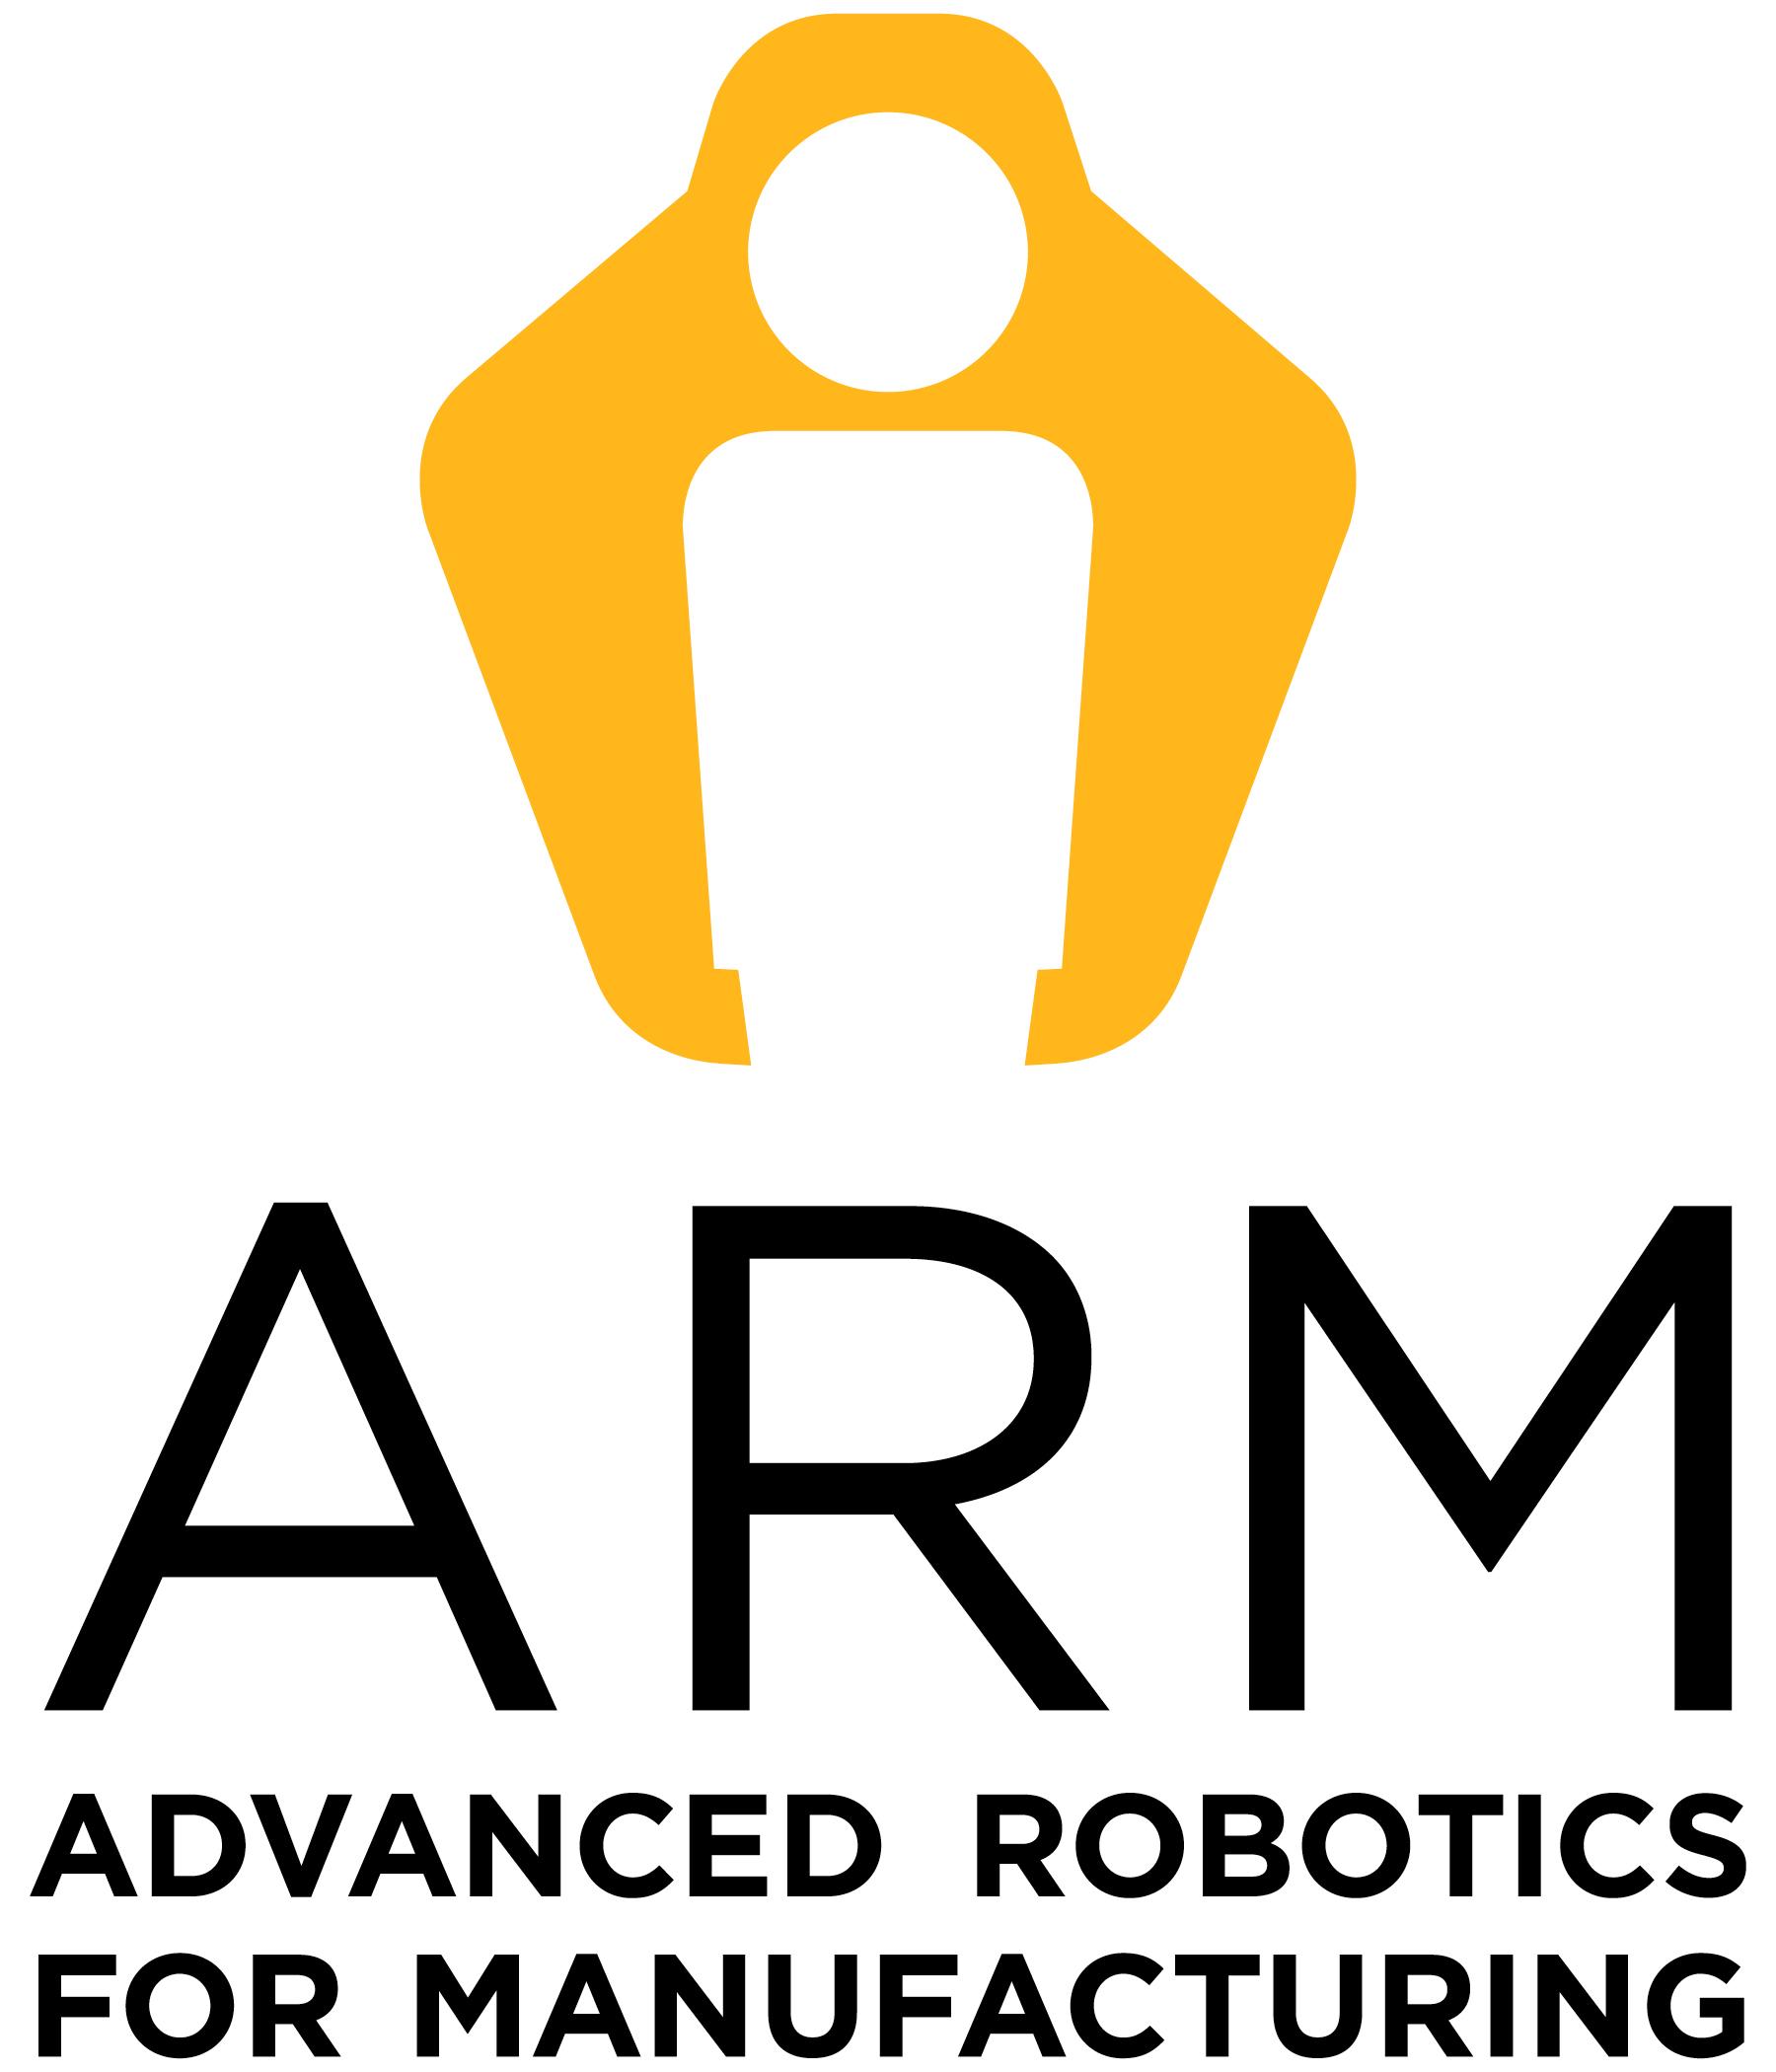 Robotics Engineer The Advanced Robotics For Manufacturing Arm